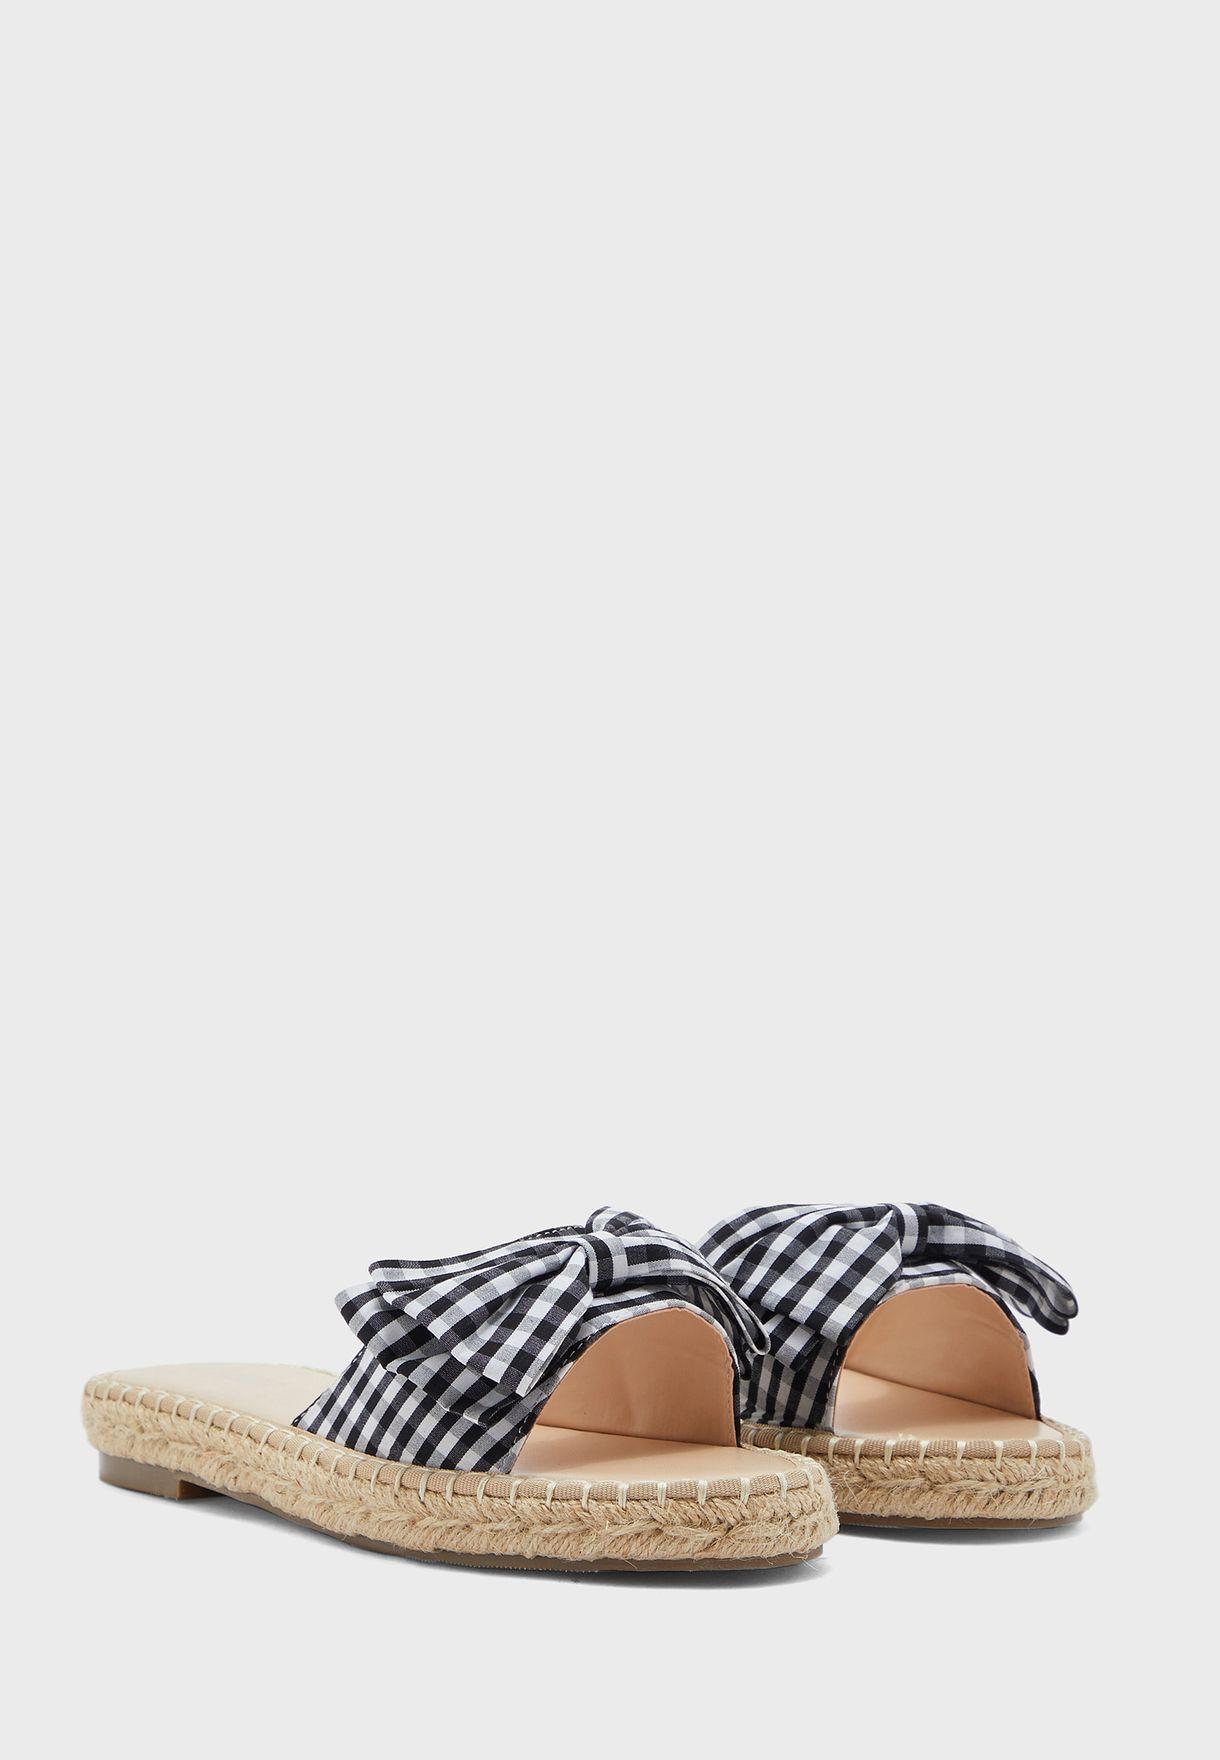 Gingham Bow Espadrille Flat Sandal